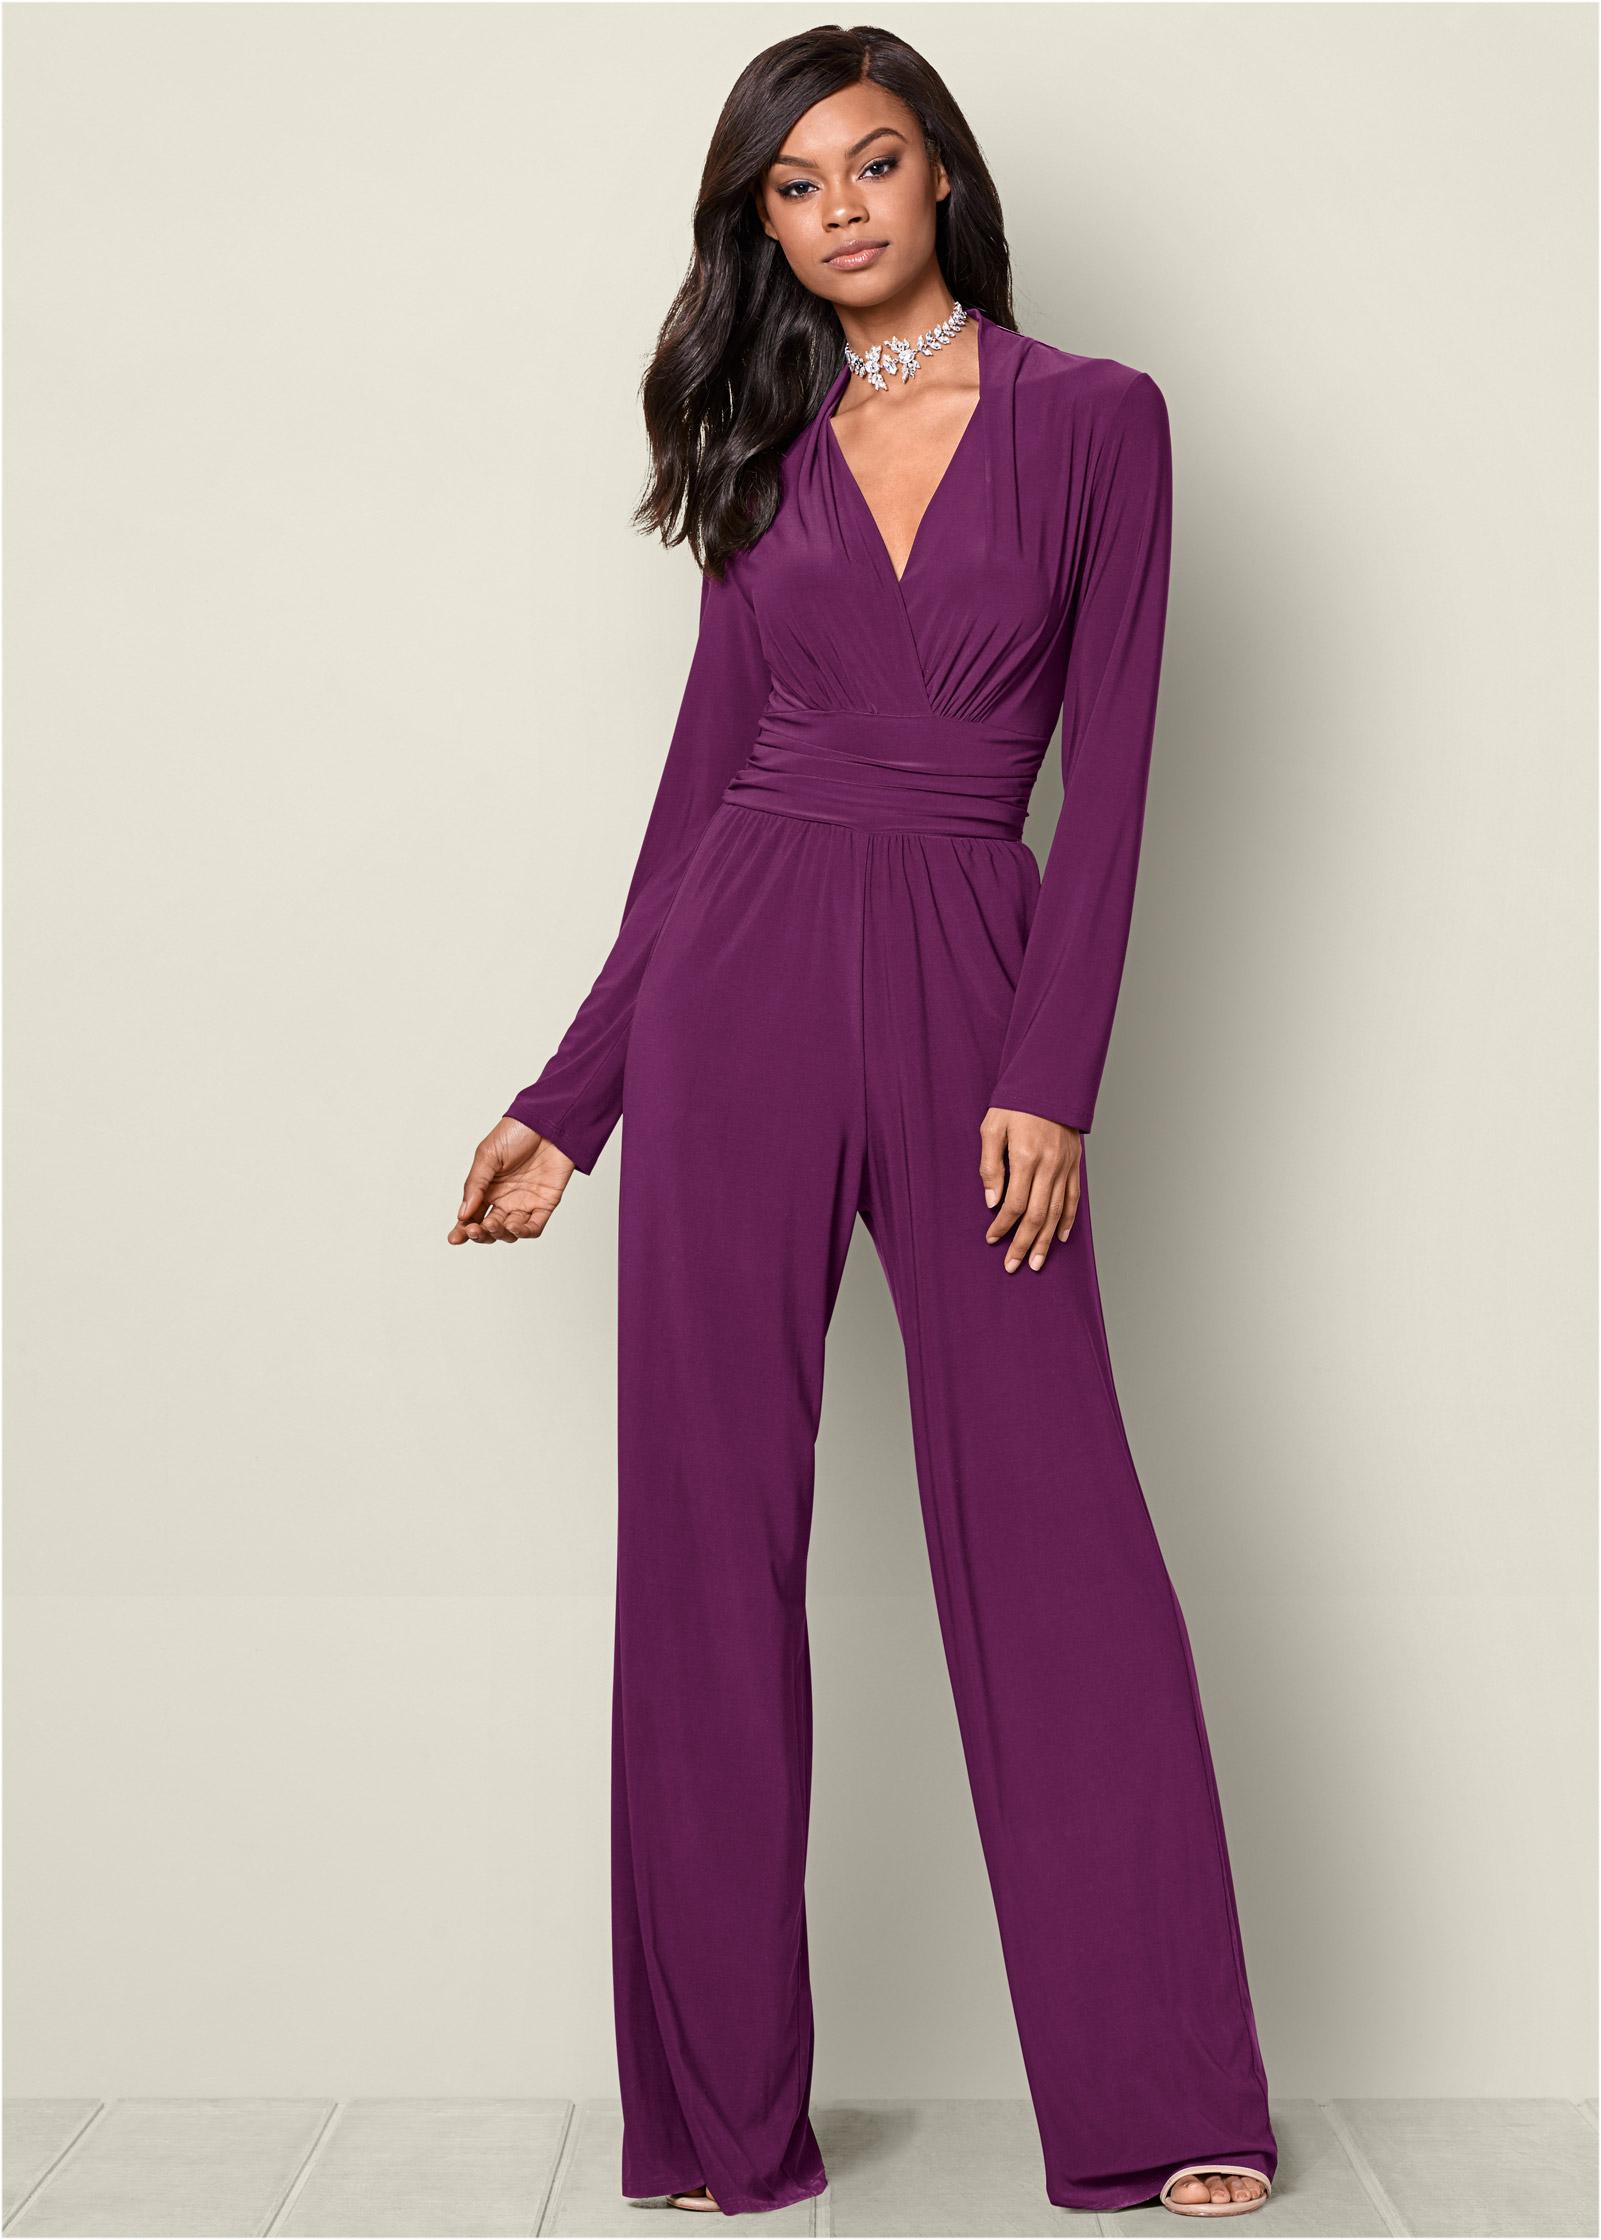 What is a jumpsuit dress images